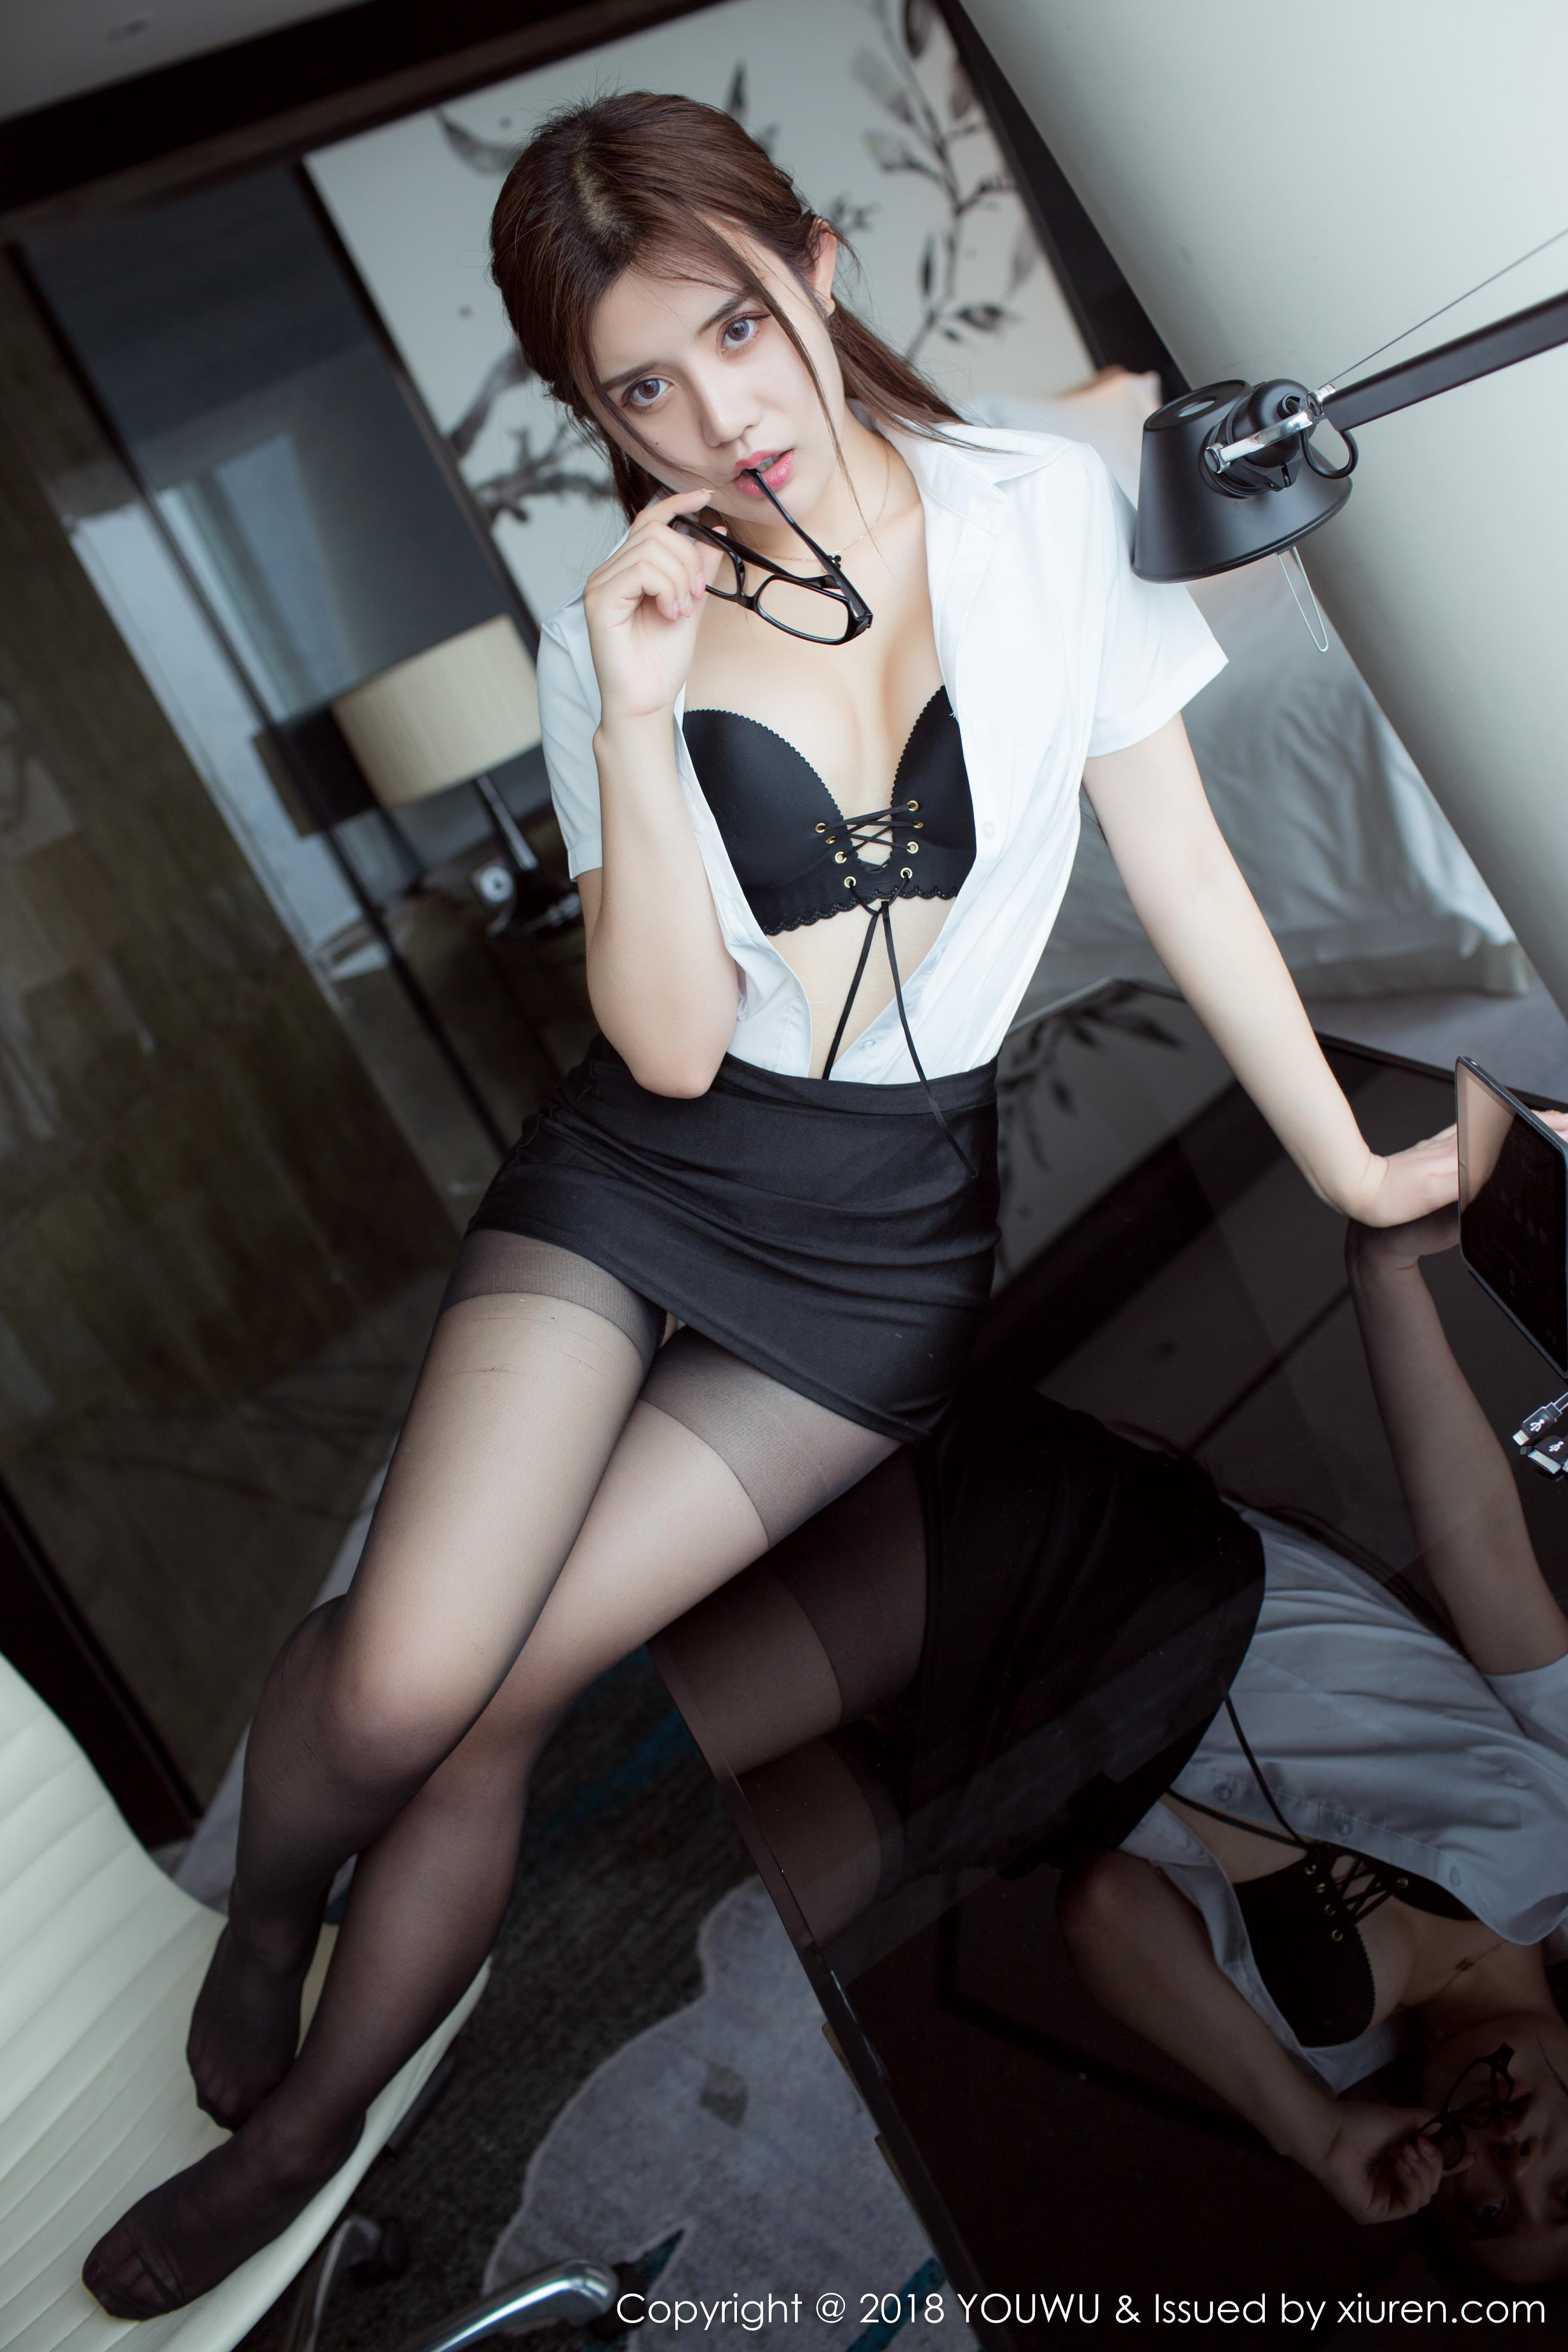 [YouWu尤物馆]YOU20180307VOL0081 性感女秘书 兔子Nina 黑色内衣与黑色包臀短裙加黑色丝袜美腿私房写真集